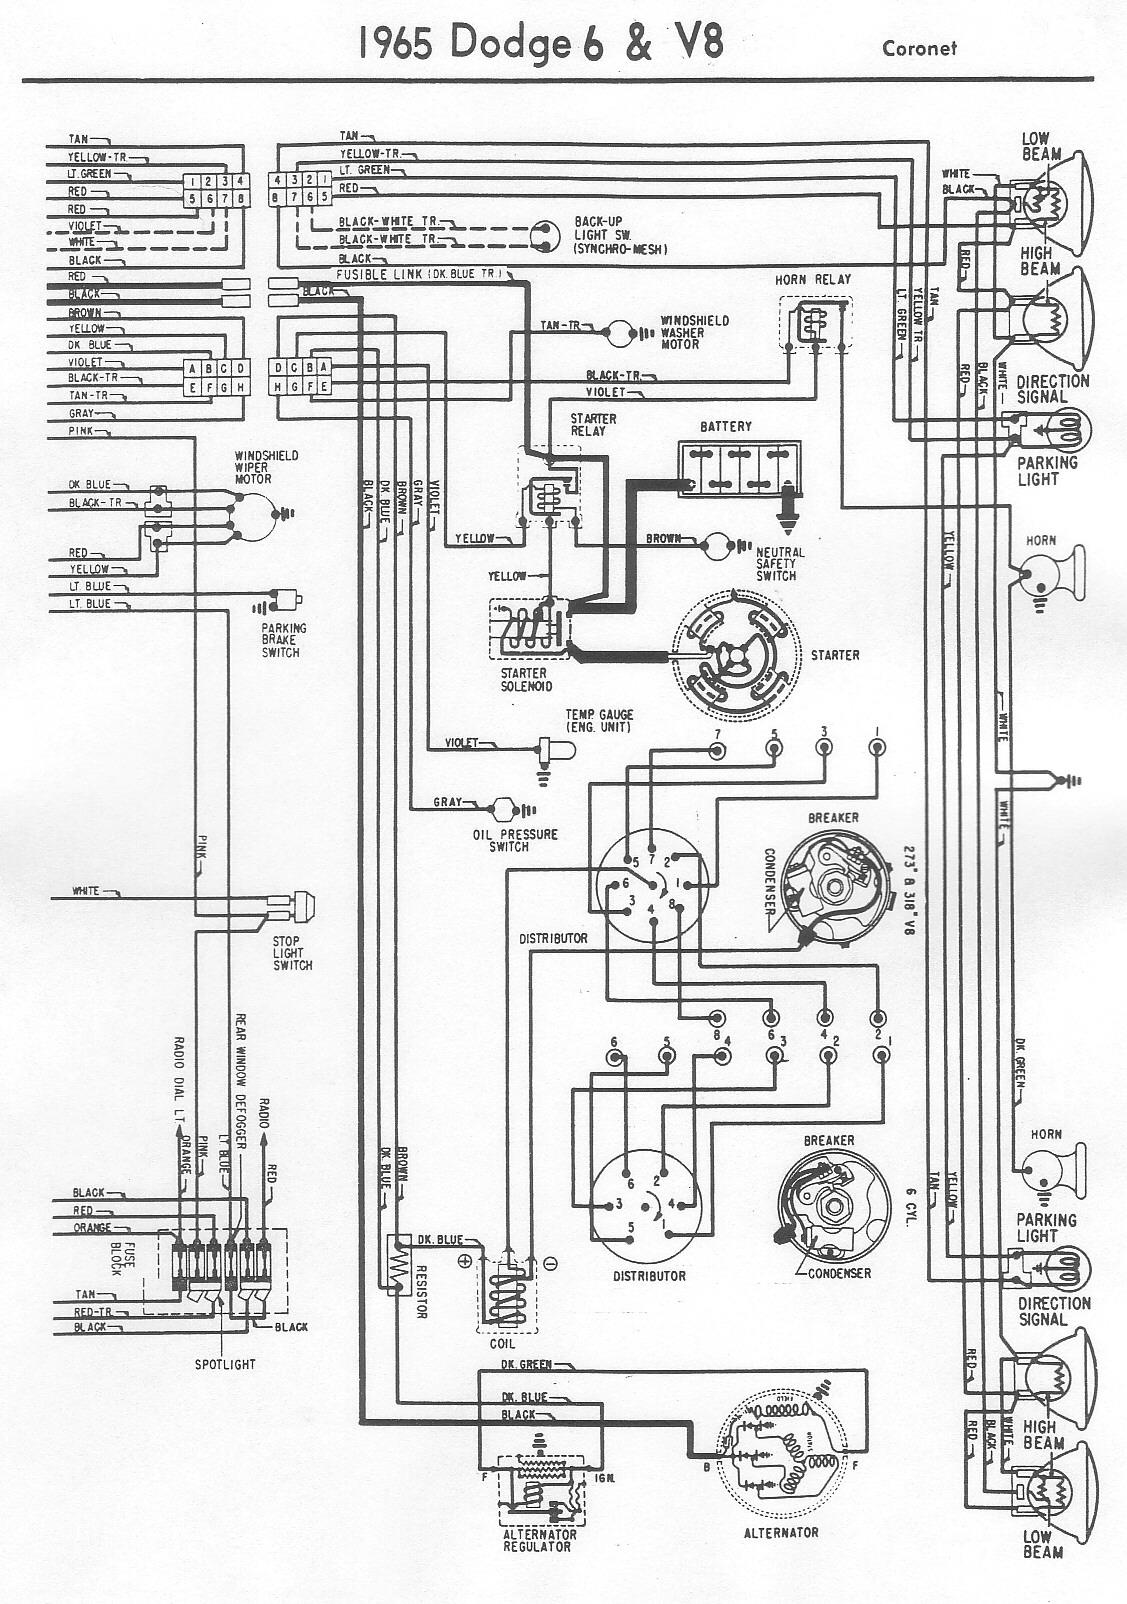 wiring diagram for 1966 dodge coronet wiring diagram todays dodge wiring diagram wires 1964 dodge coronet [ 1127 x 1604 Pixel ]